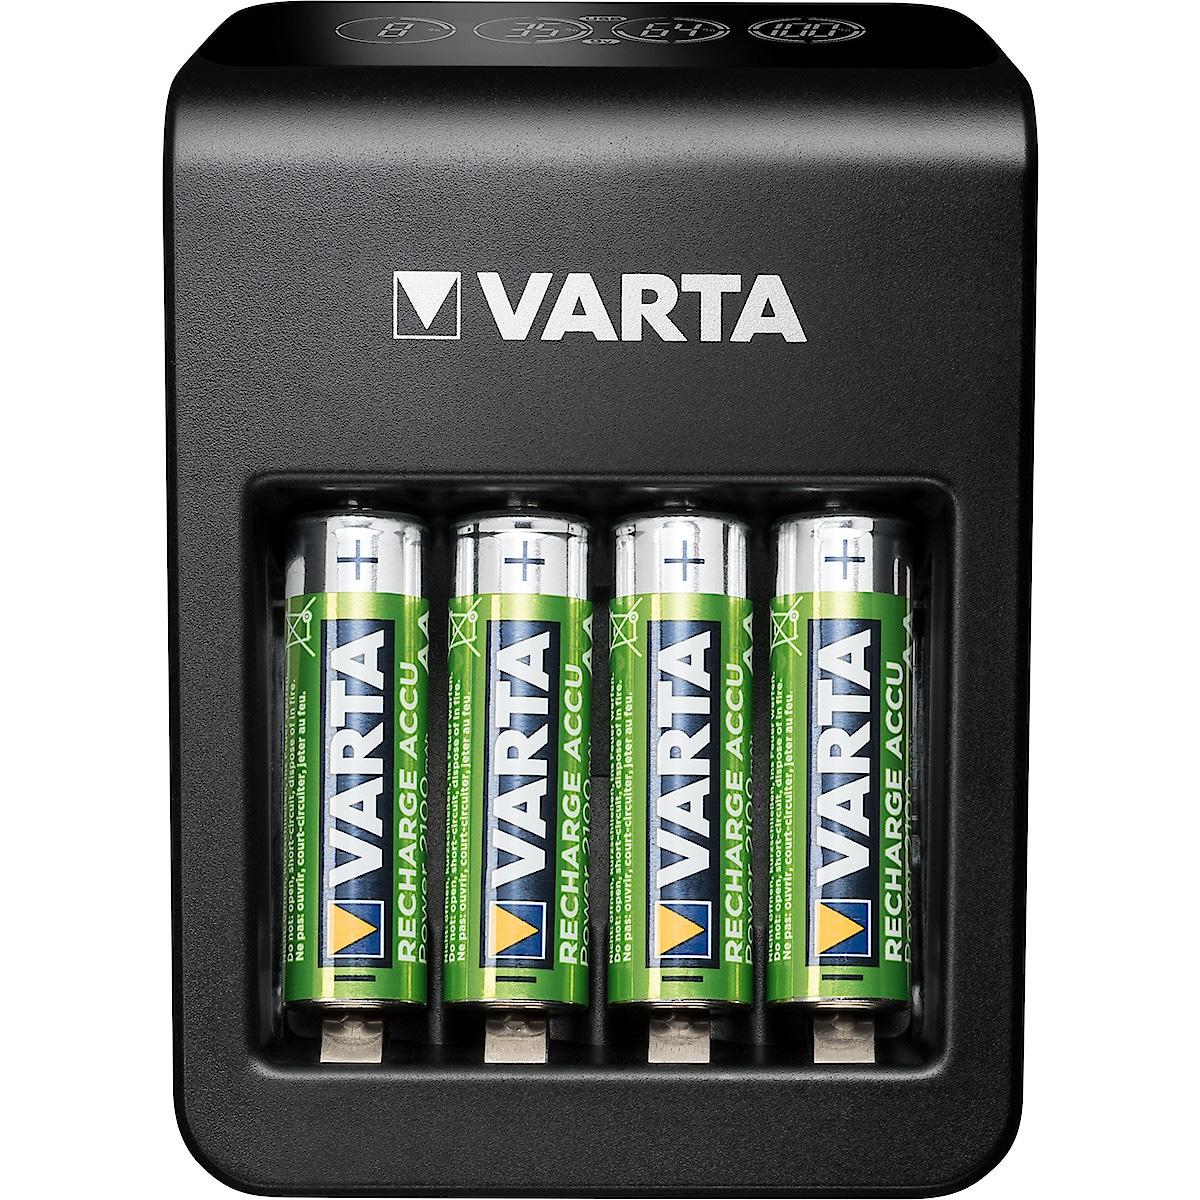 Batteriladdare VARTA LCD Plug Charger+